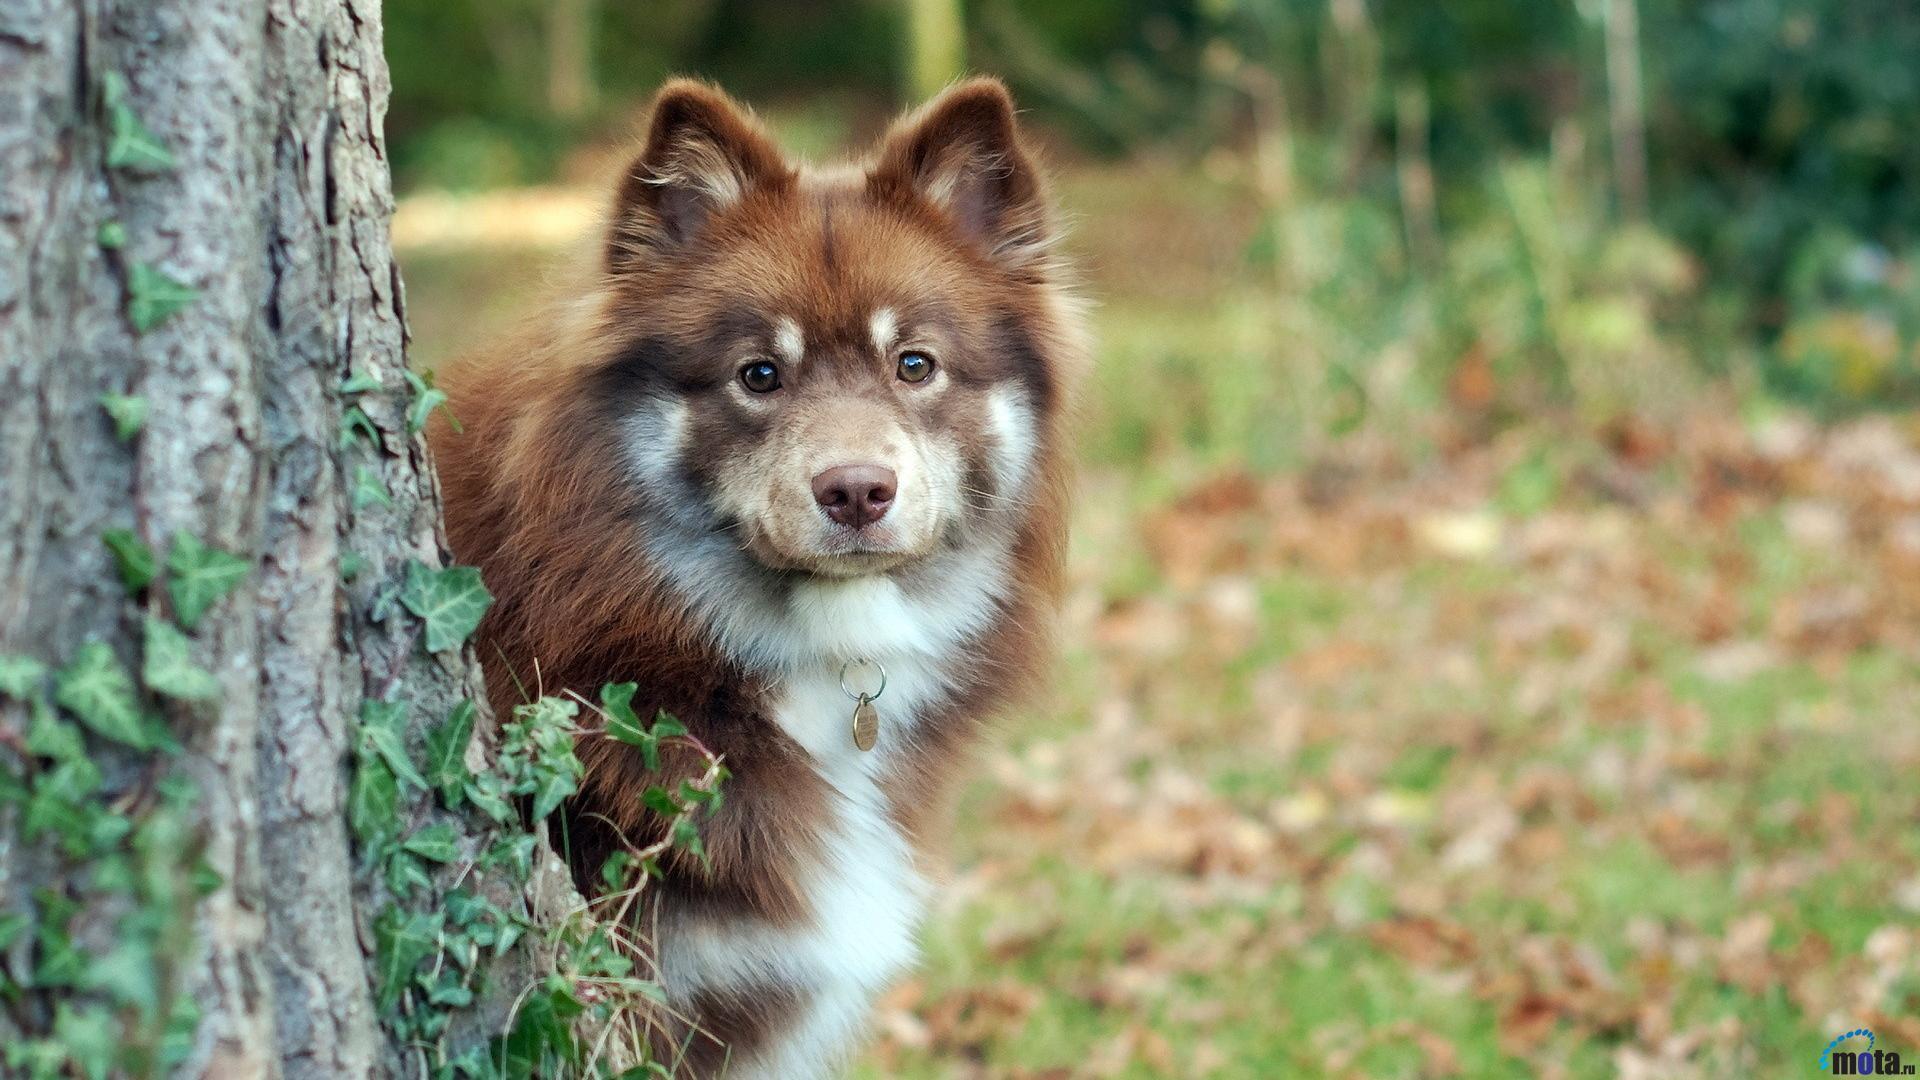 Download Wallpaper Australian Shepherd Puppy 1920 x 1080 HDTV 1080p 1920x1080